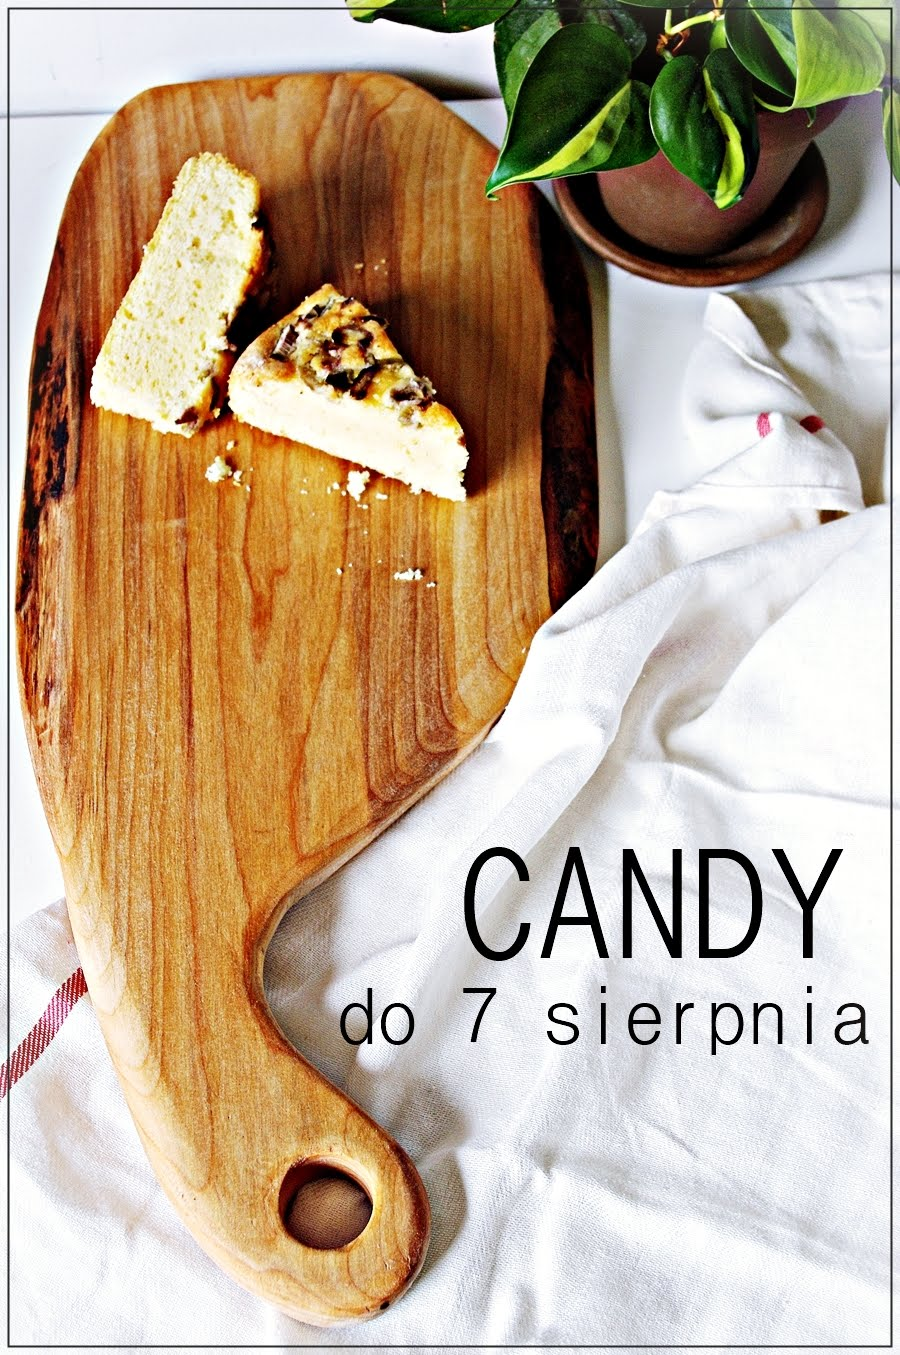 Candy u Any